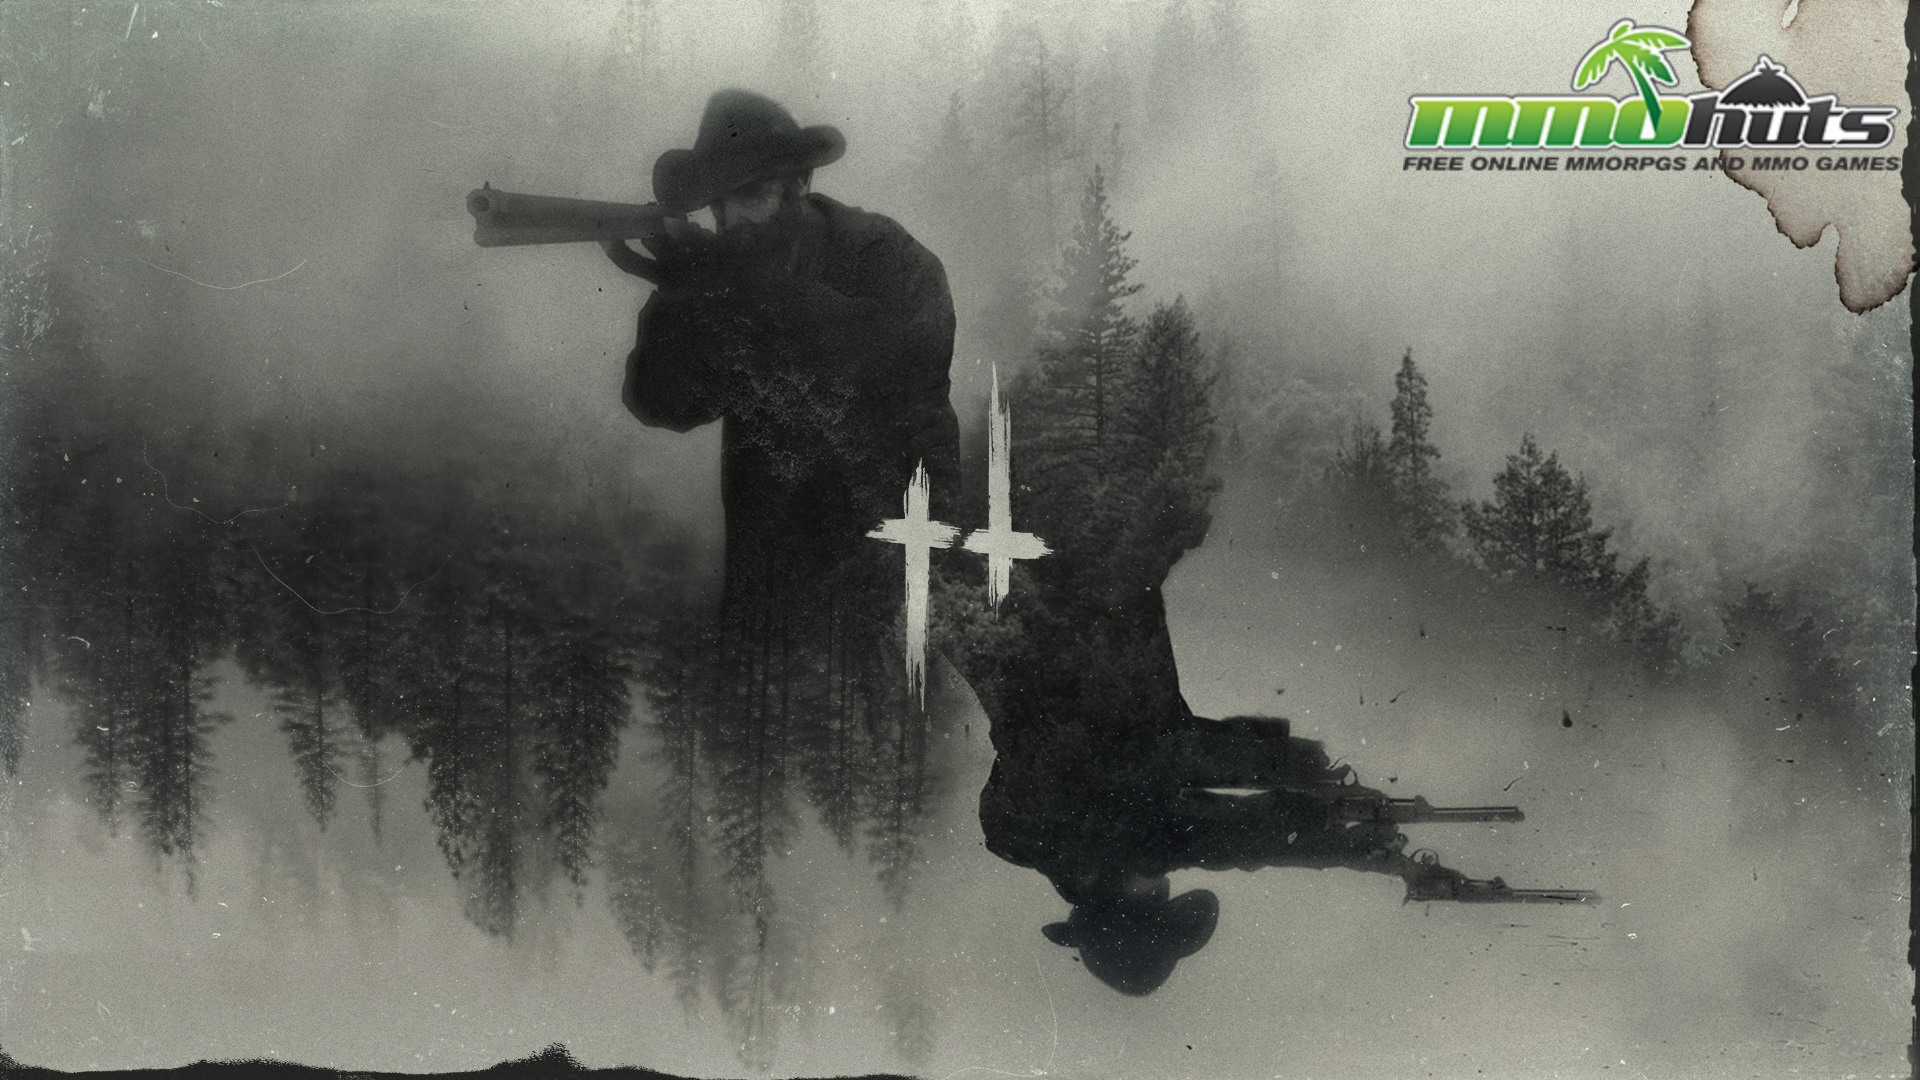 Hunt Showdown MMOHuts